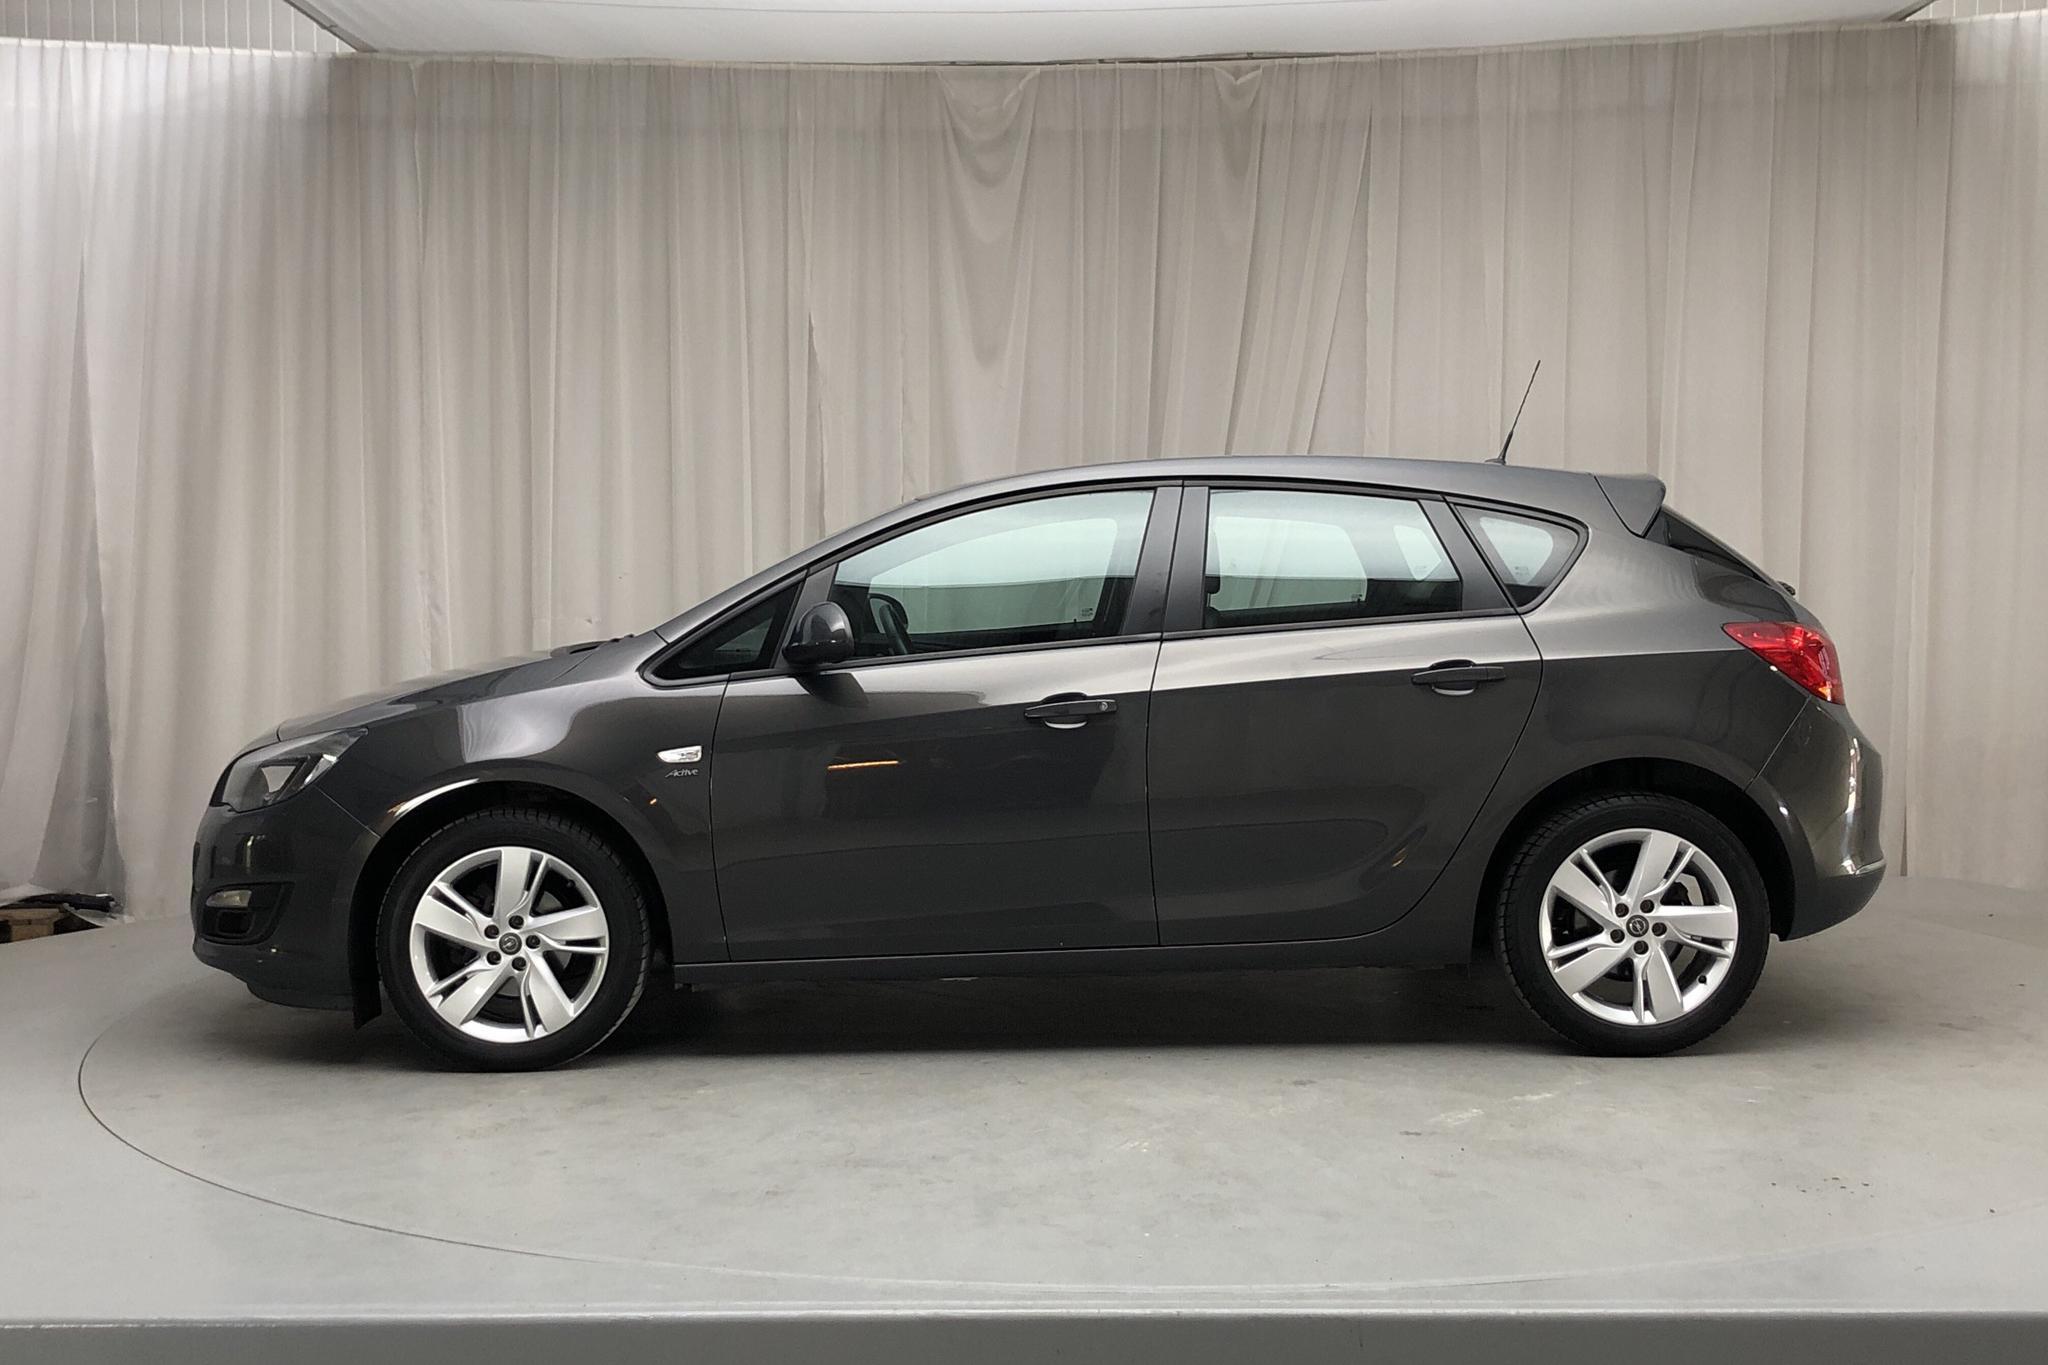 Opel Astra 1.6 ECOTEC 5dr (115hk) - 68 380 km - Manual - gray - 2014